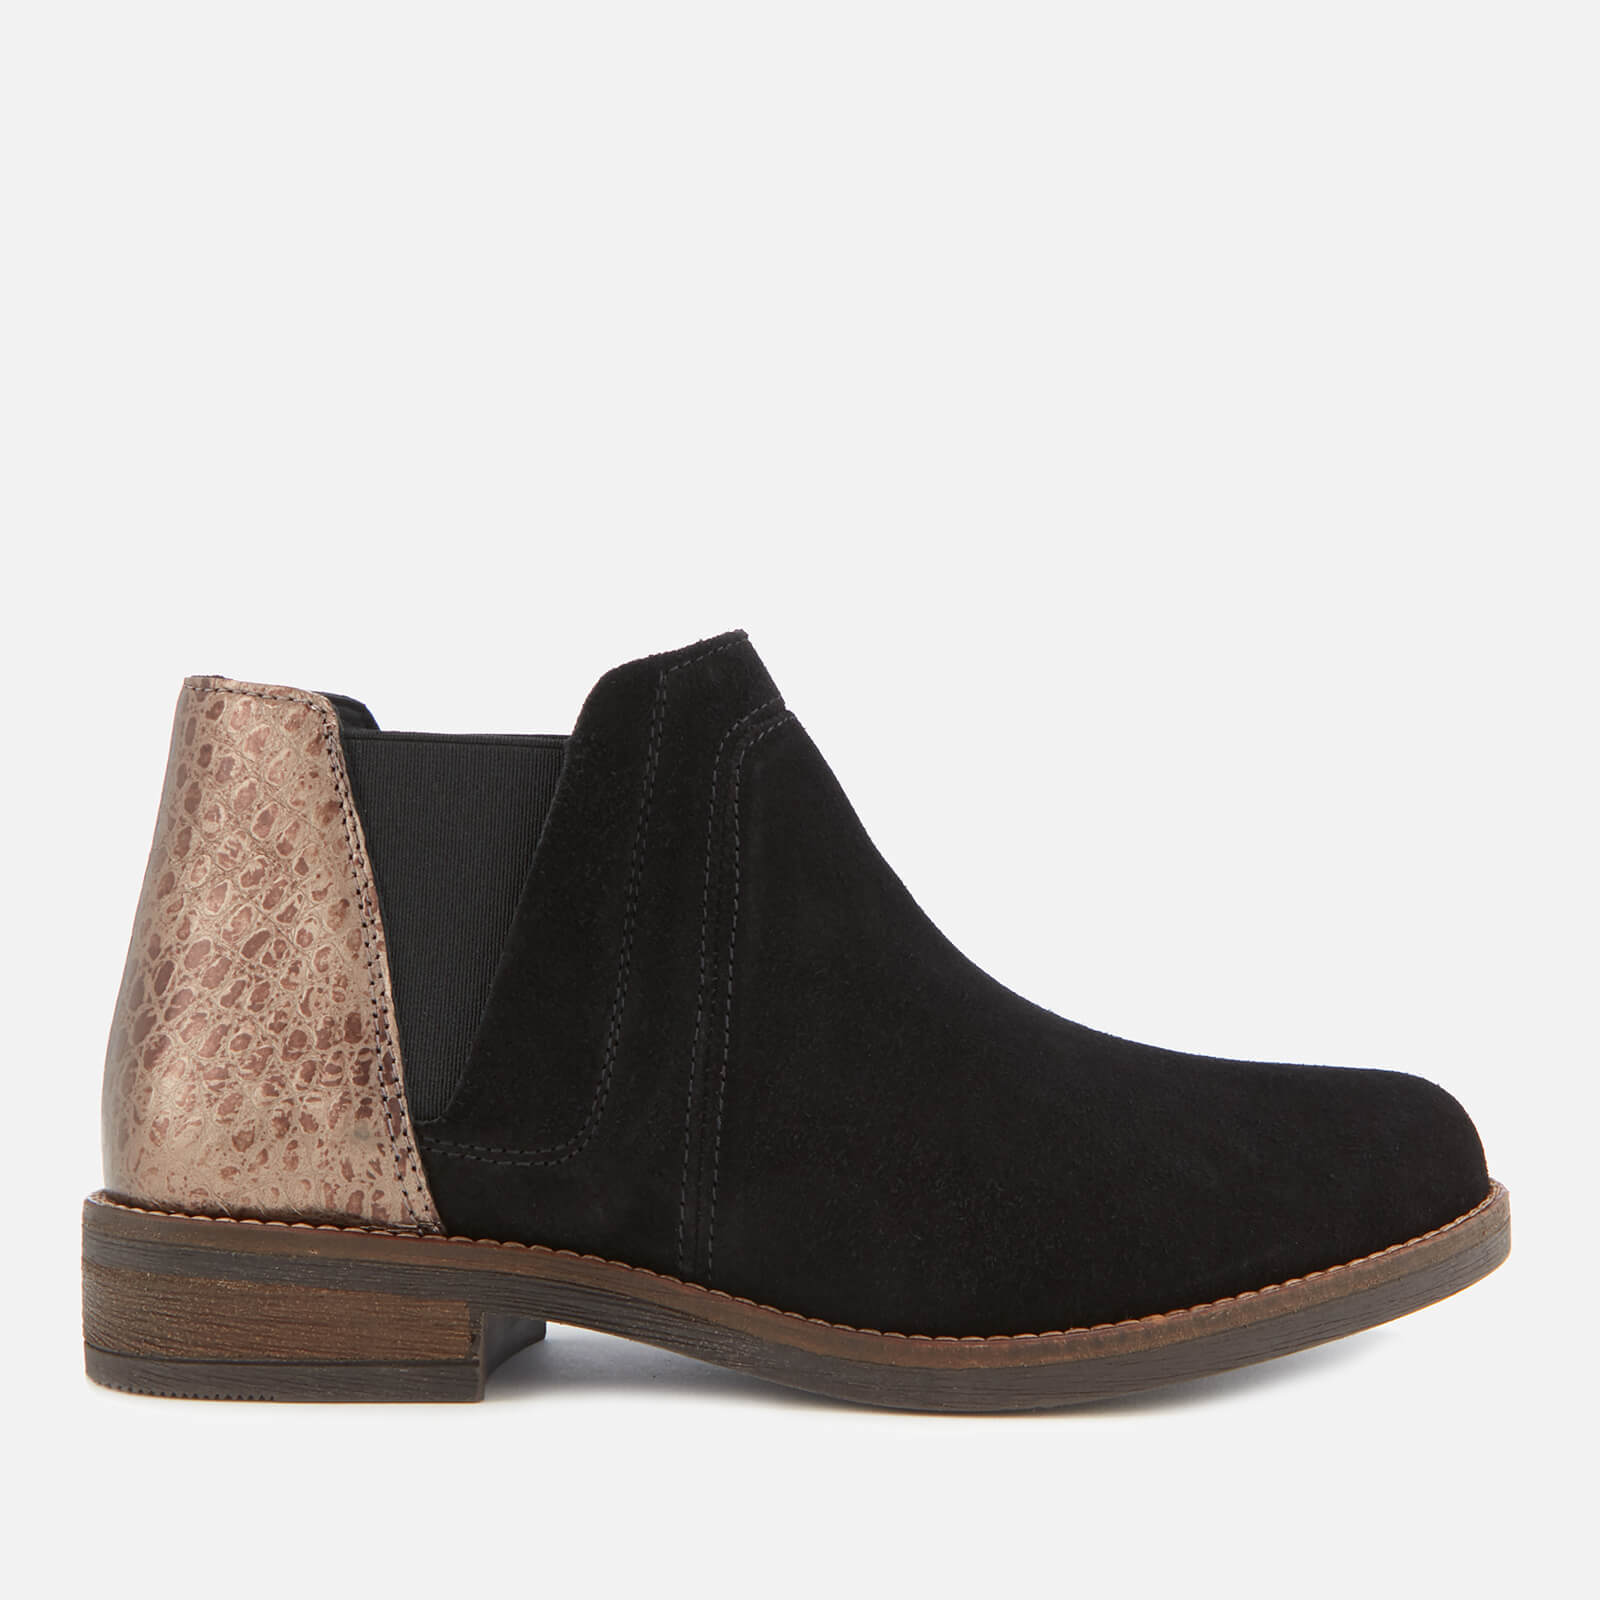 8bb23de68 Clarks Women's Demi Beat Suede Ankle Boots - Black Interest   FREE UK  Delivery   Allsole